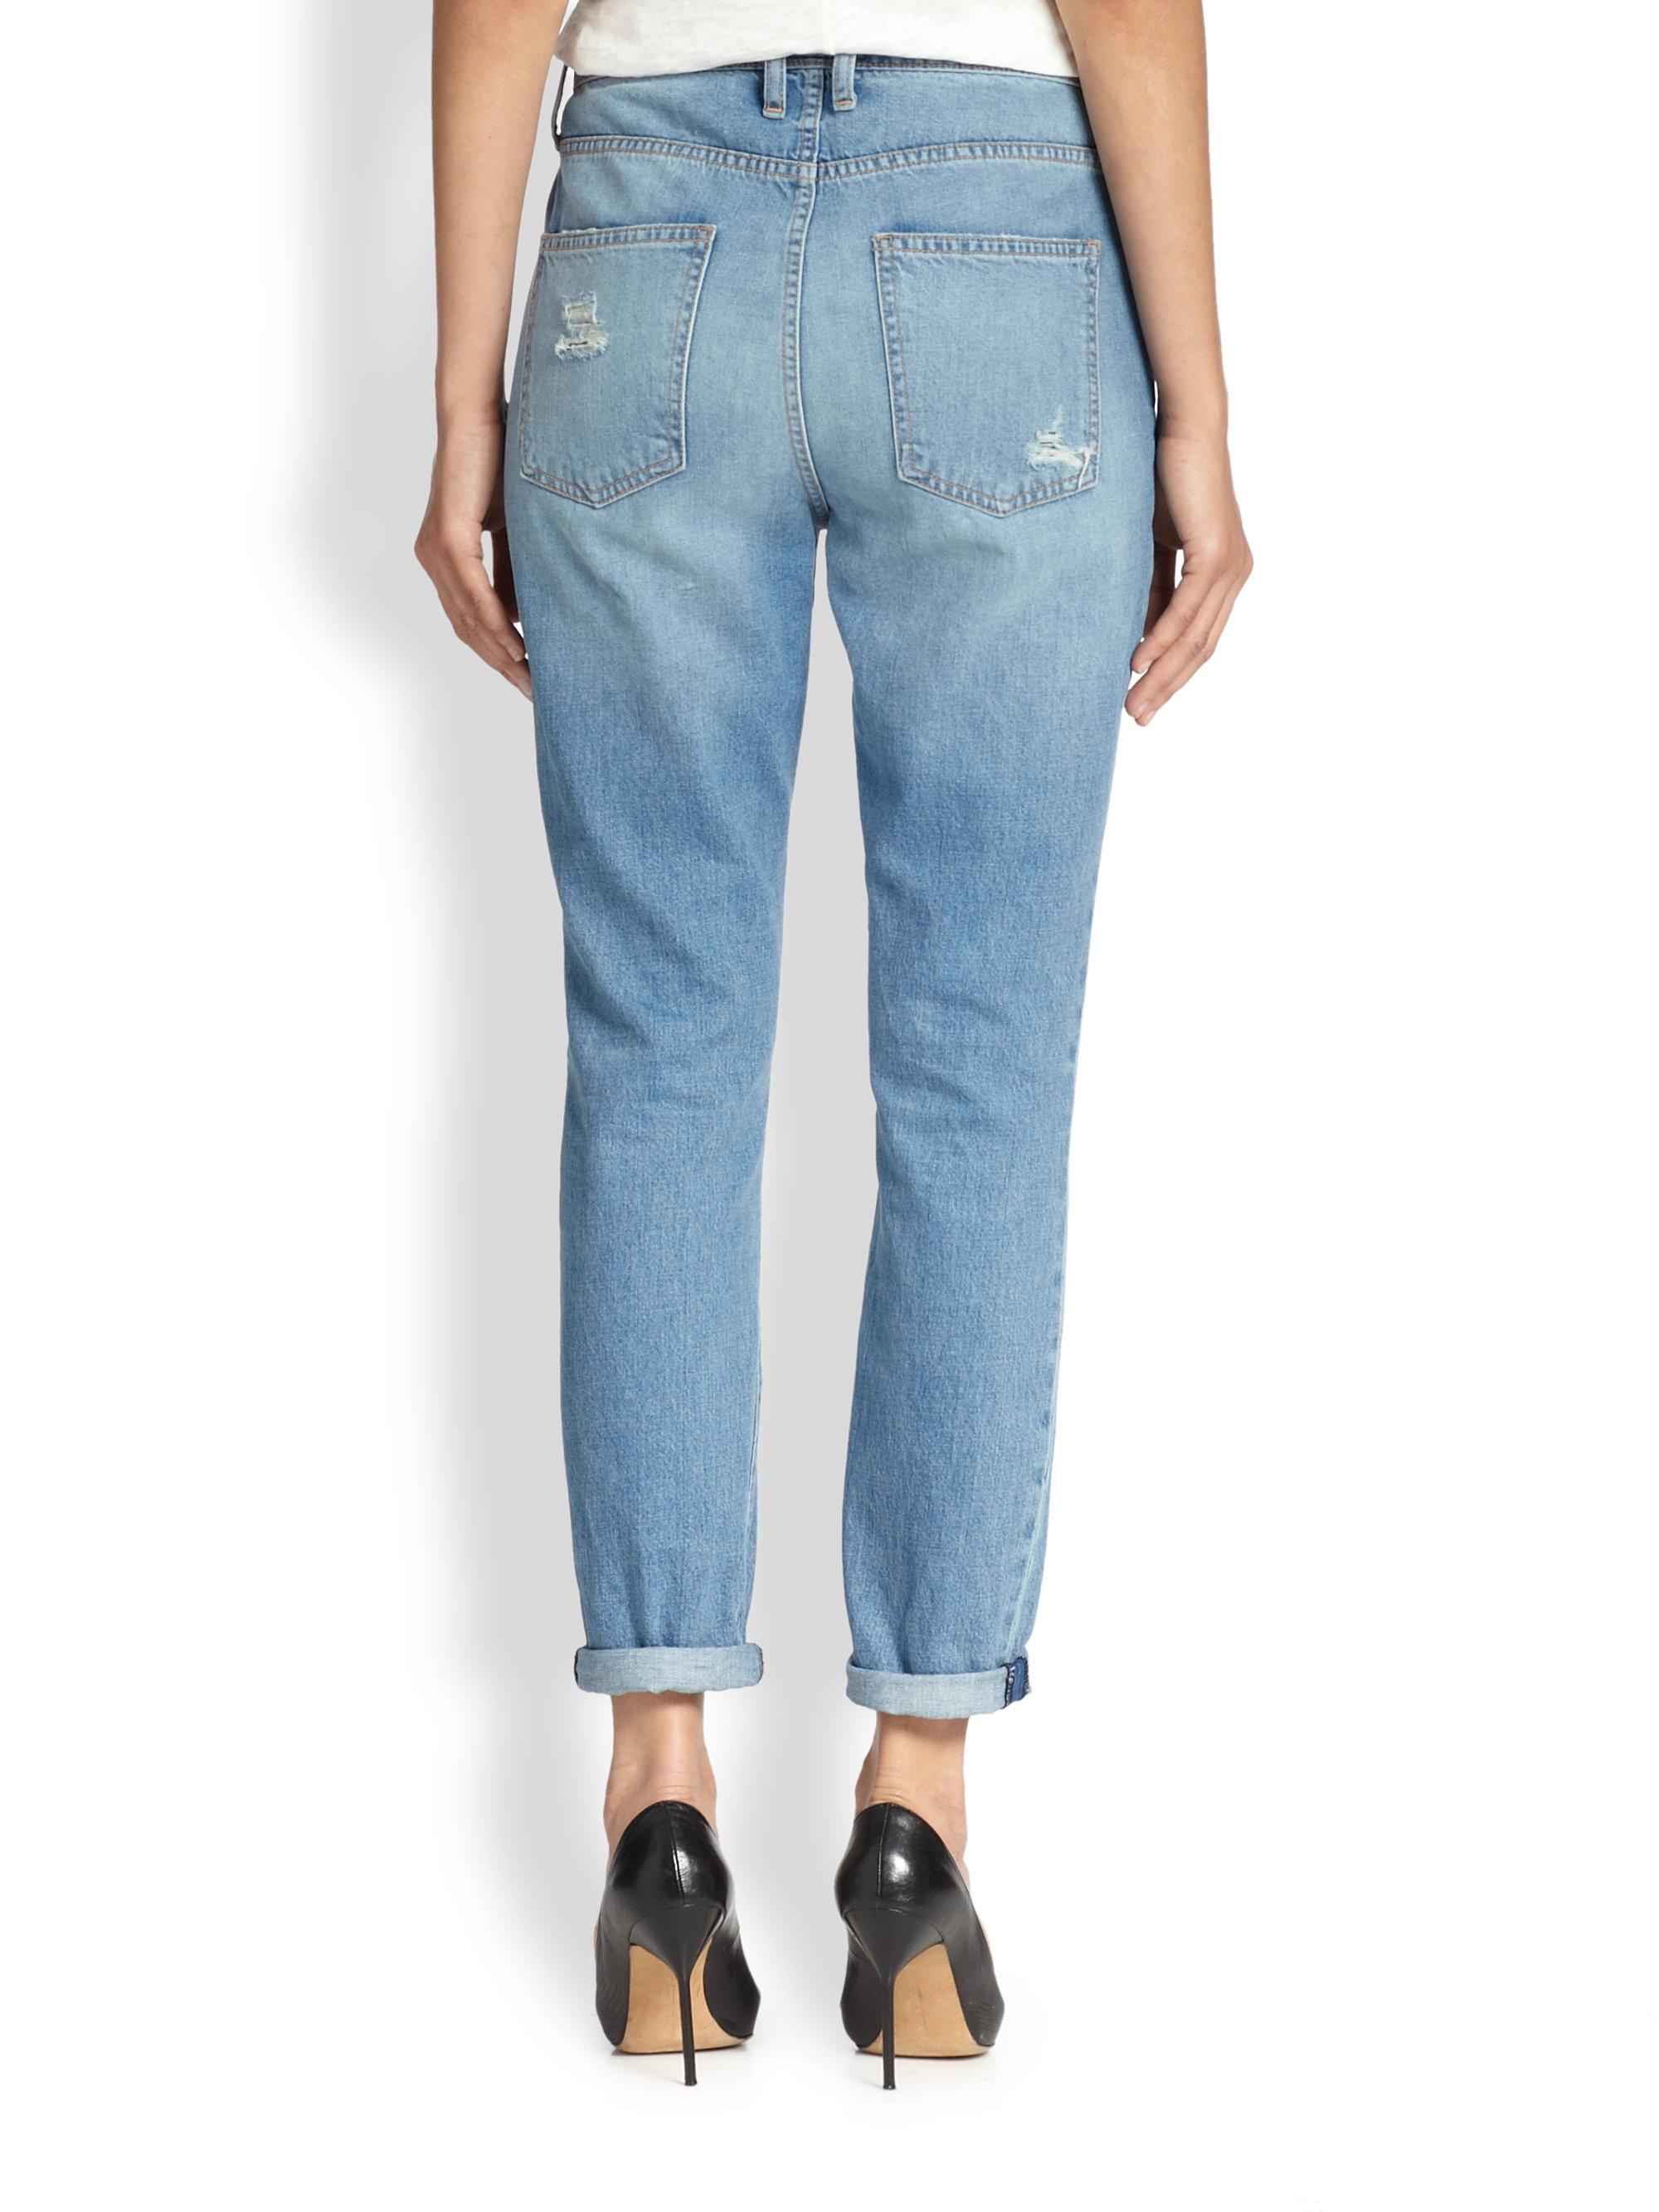 Current/elliott The Fling Patchwork Boyfriend Jeans in Blue | Lyst